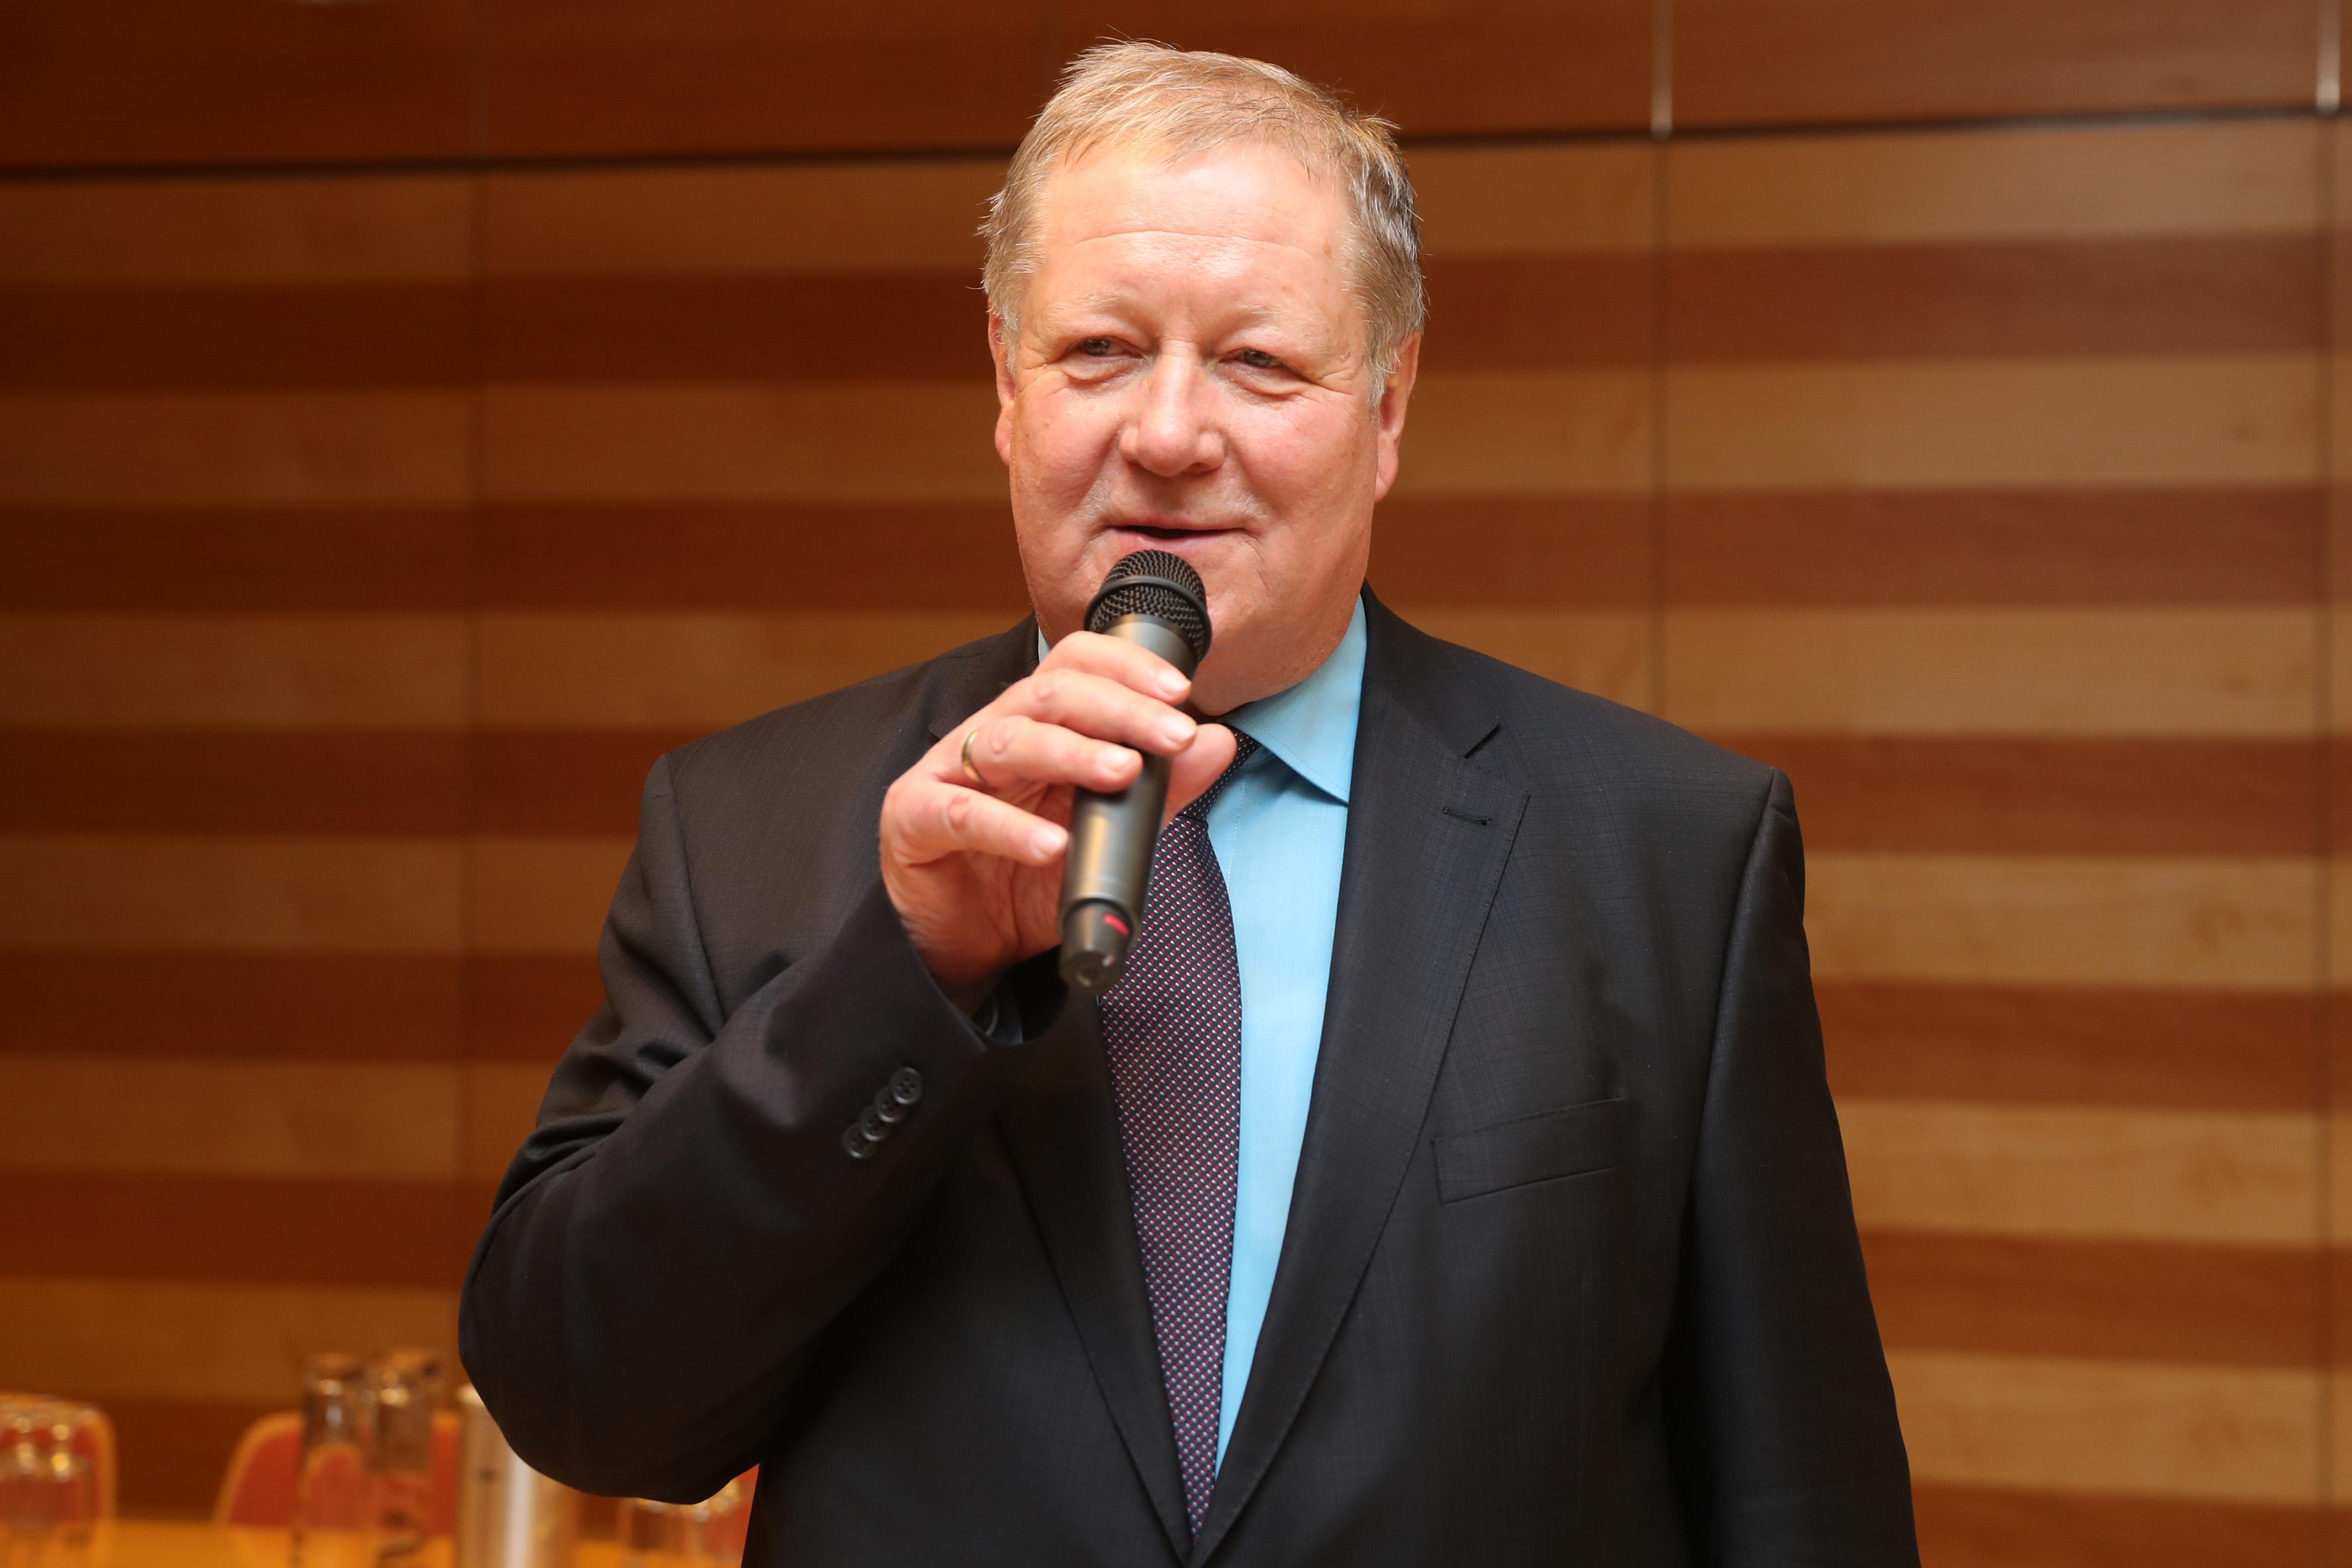 27.01.2017 - Presseclub Saar - Neujahrsempfang - Sb -